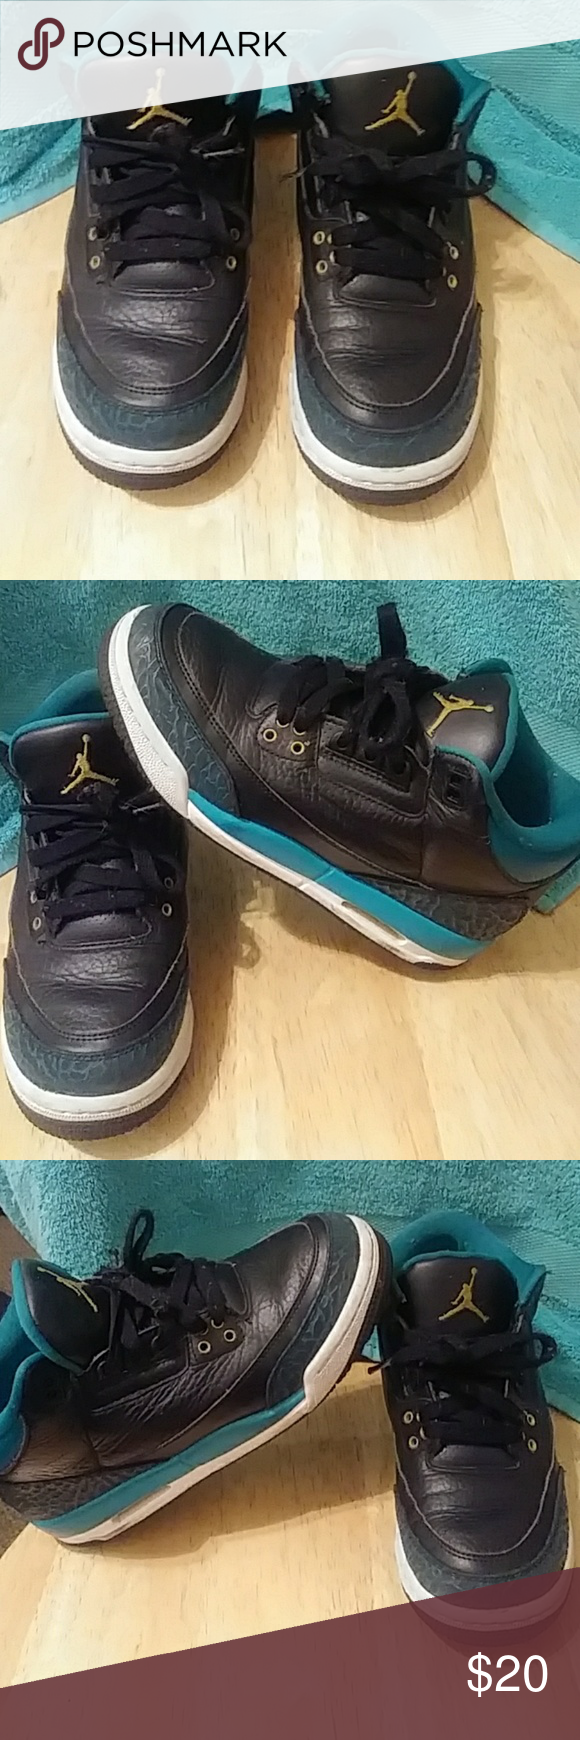 a392f83f5b5c20 Air Jordan 3 III Retro Gg Gs Air Jordan 3 III Retro Gg Gs Sz 6Y Jaguars Blk Gold  Rio Teal 441140 018 no insoles on both sneakers Jordan Shoes Sneakers